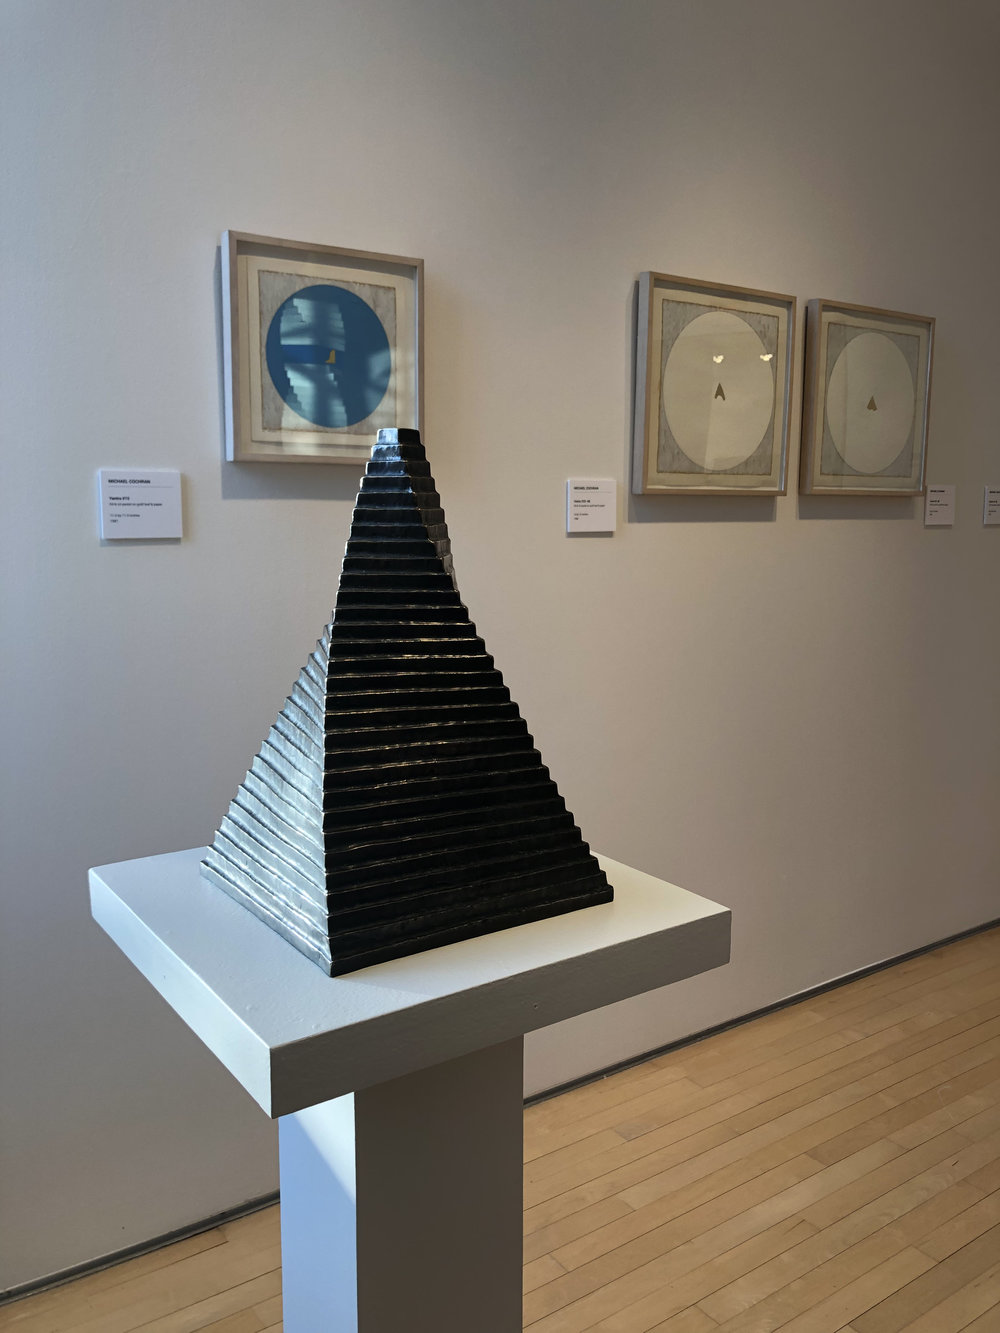 "Michael Cochran Draconis 1982, 15"" x 10"" x 10"", bronze"